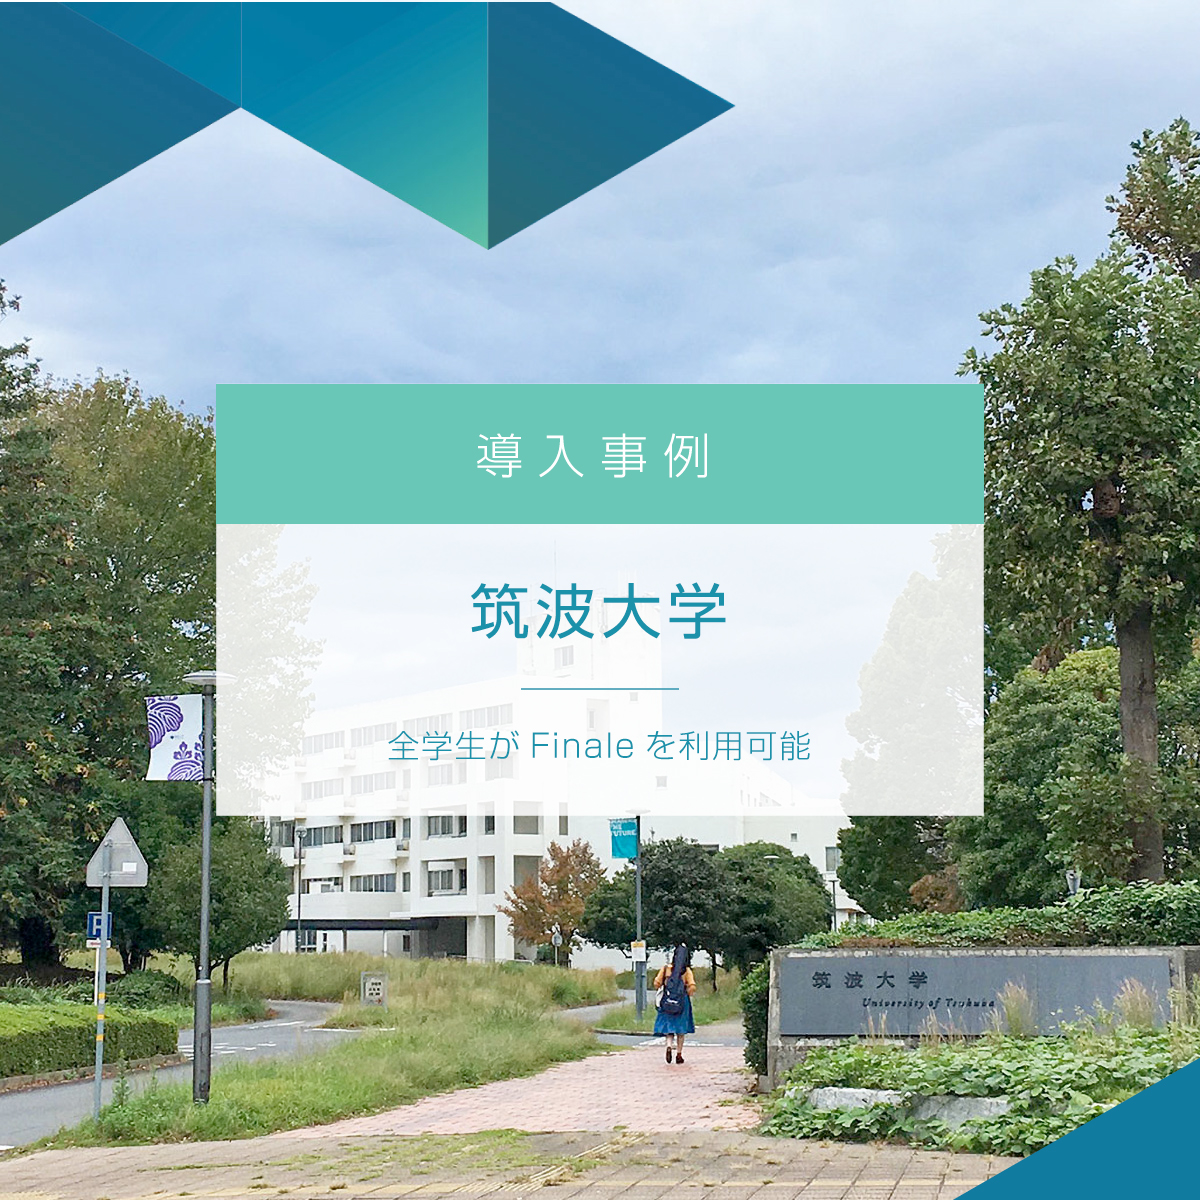 Finale導入事例:筑波大学